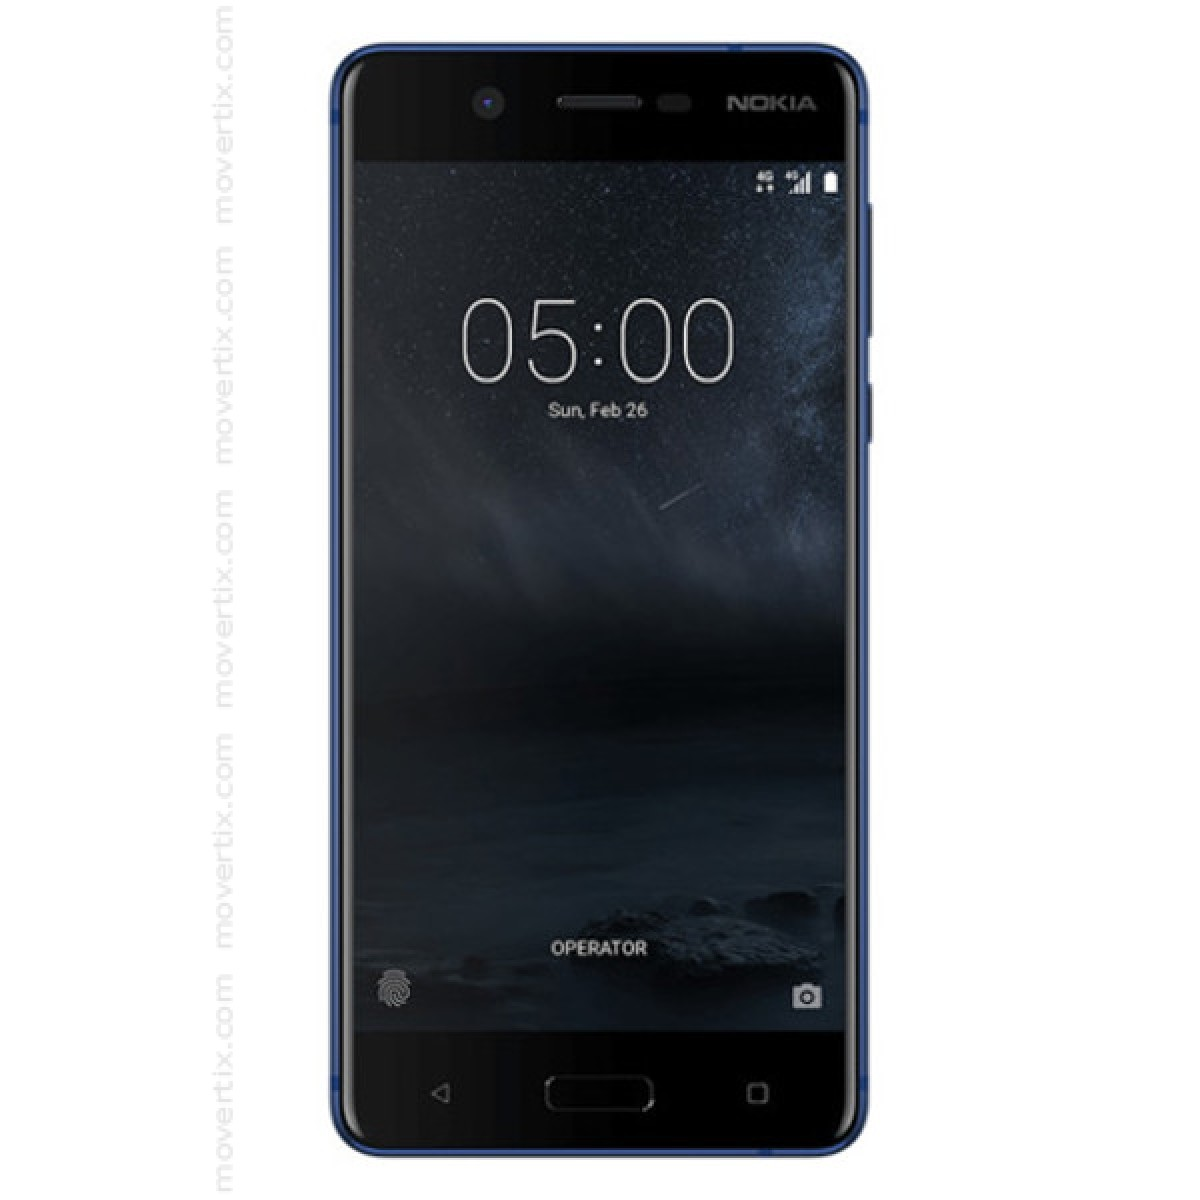 c038f6823f0 Nokia and Microsoft Lumia smartphones and mobile phones   Movertix ...